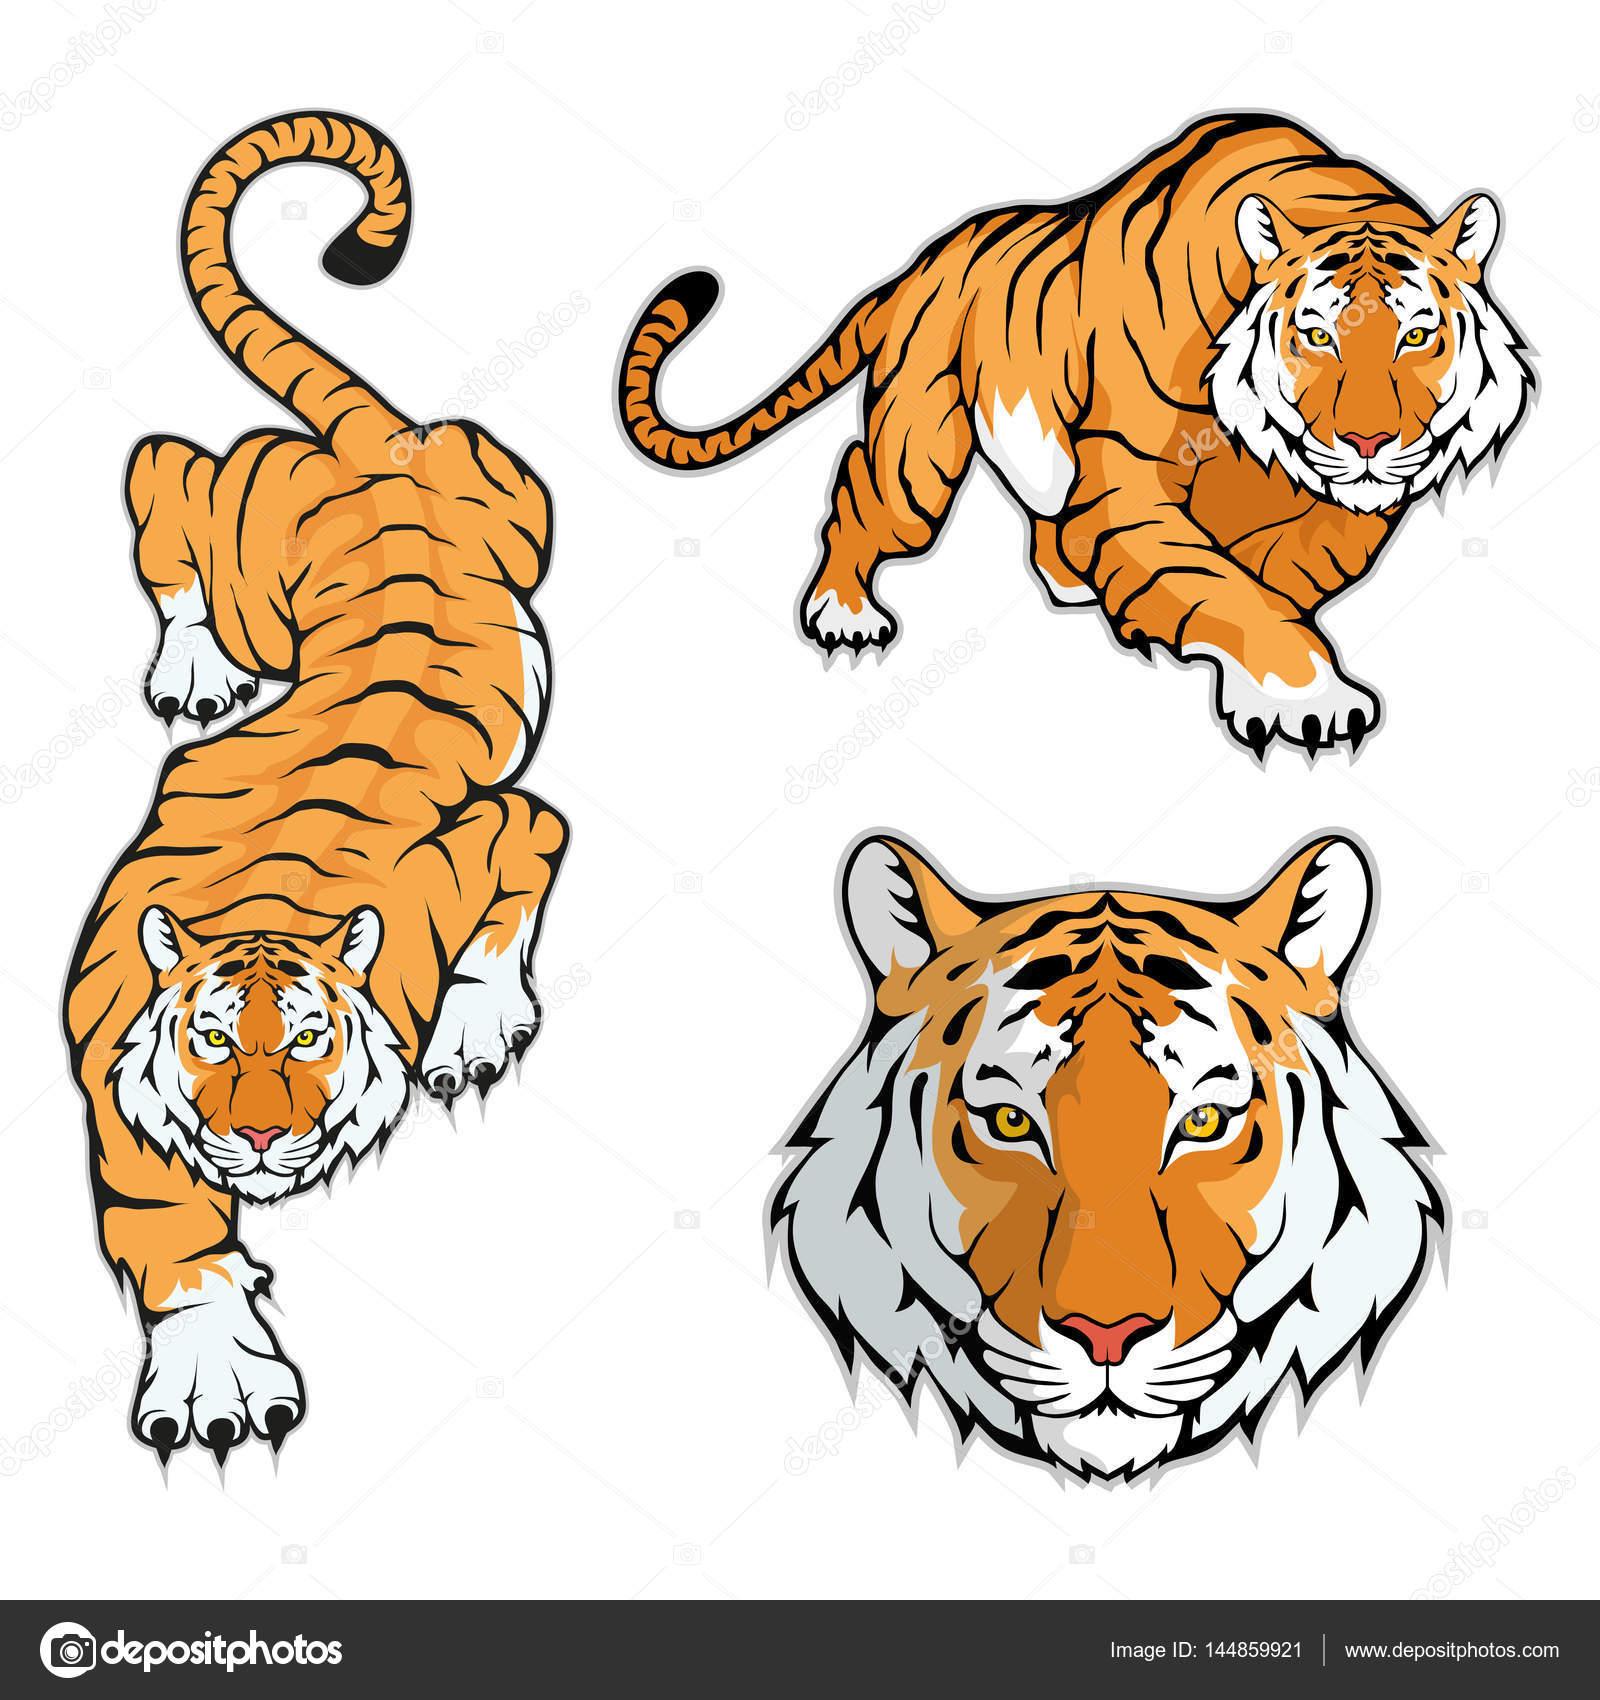 images printable tiger tiger logo template stock vector c korniakovstock gmail com 144859921 https depositphotos com 144859921 stock illustration tiger logo template html